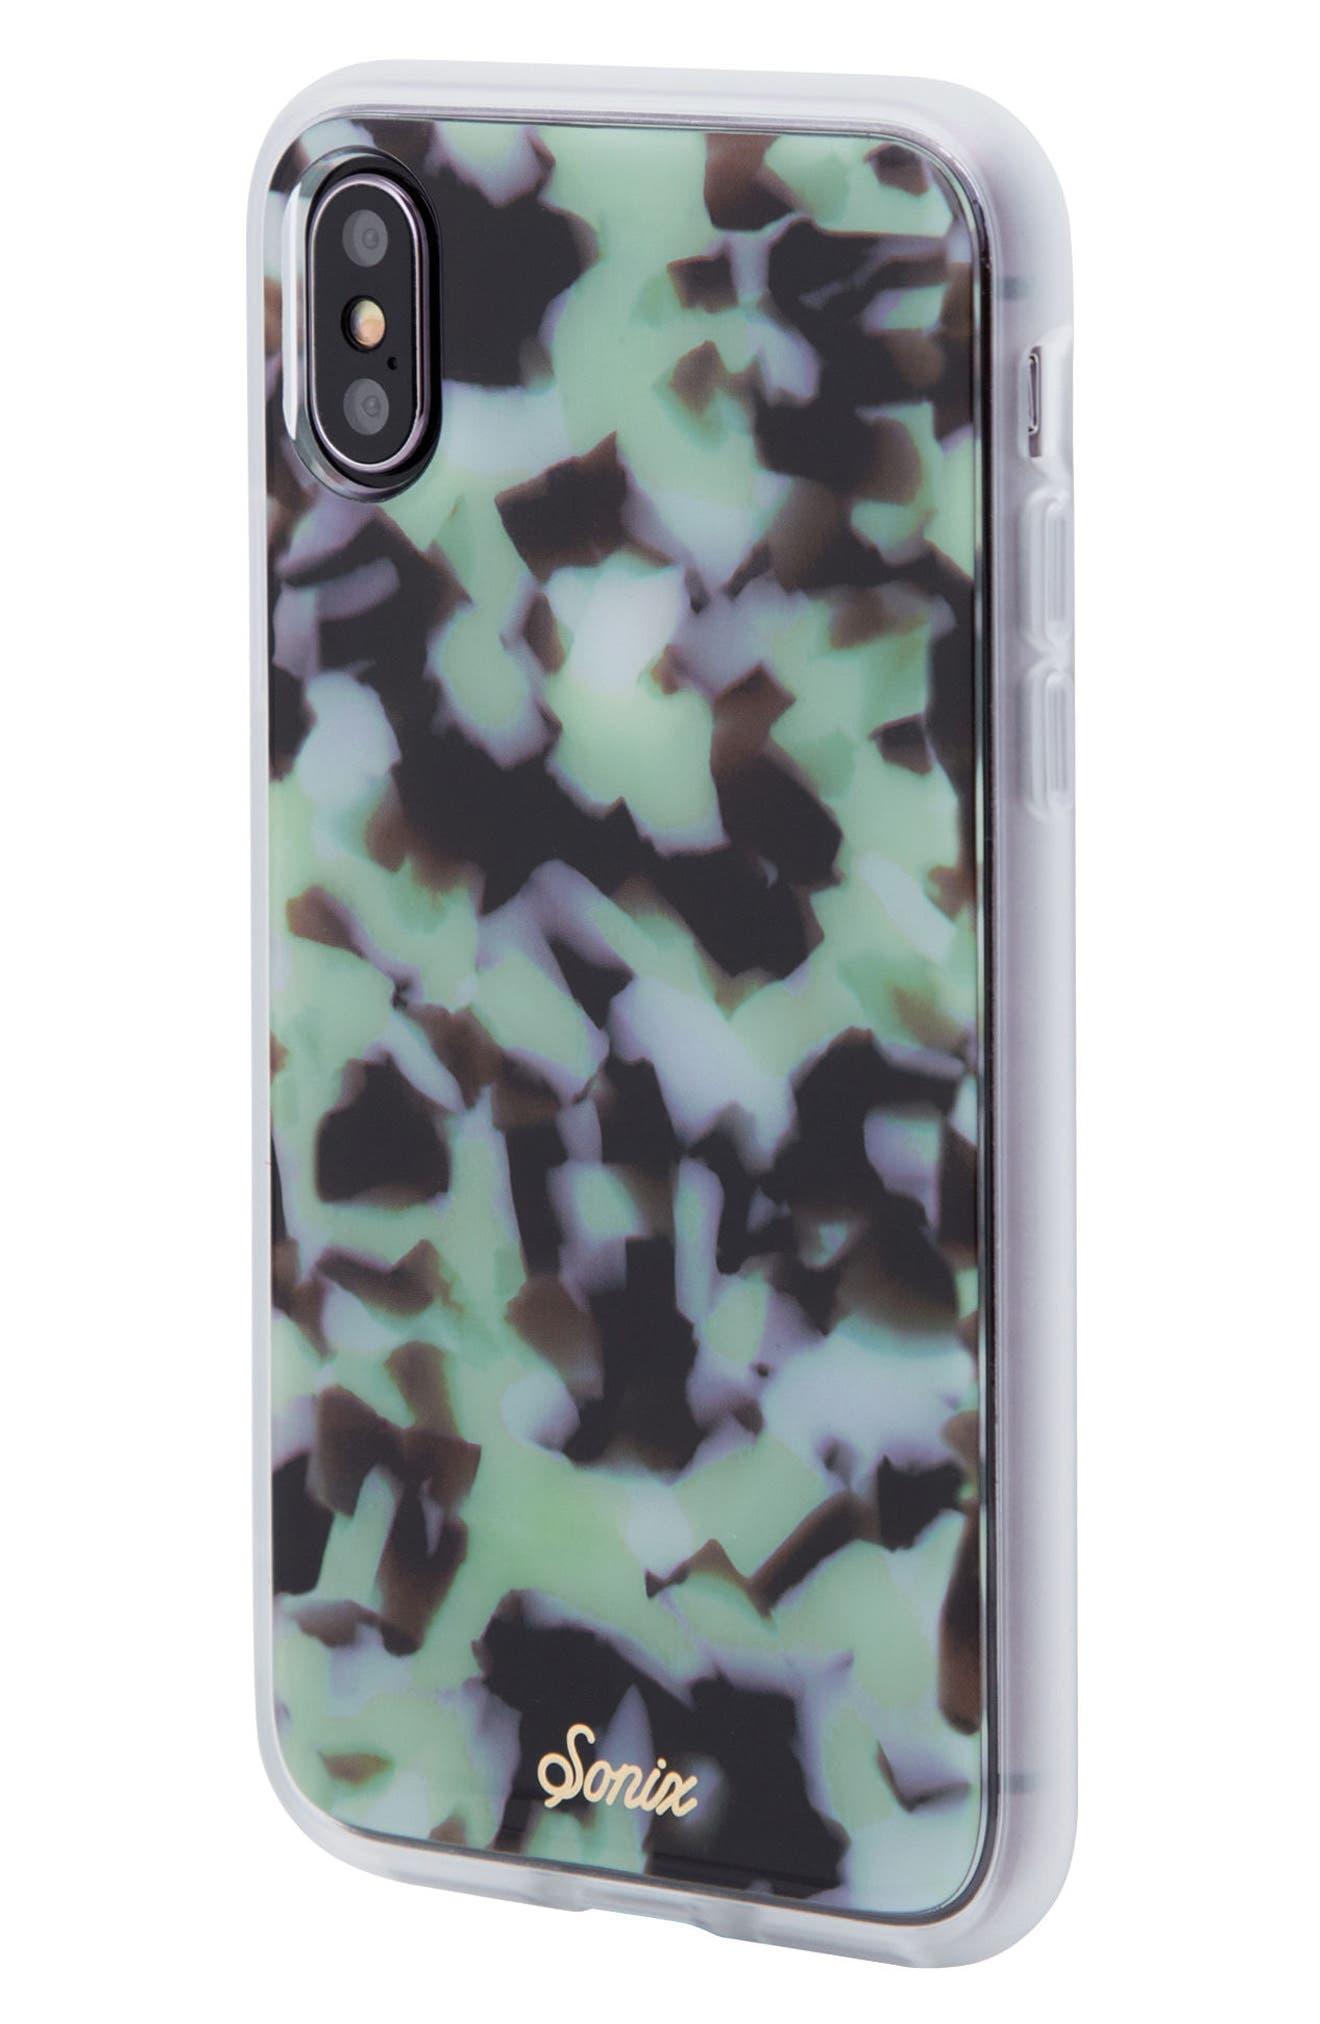 Sonic Terrazzo Mint iPhone X Case,                             Alternate thumbnail 2, color,                             Mint